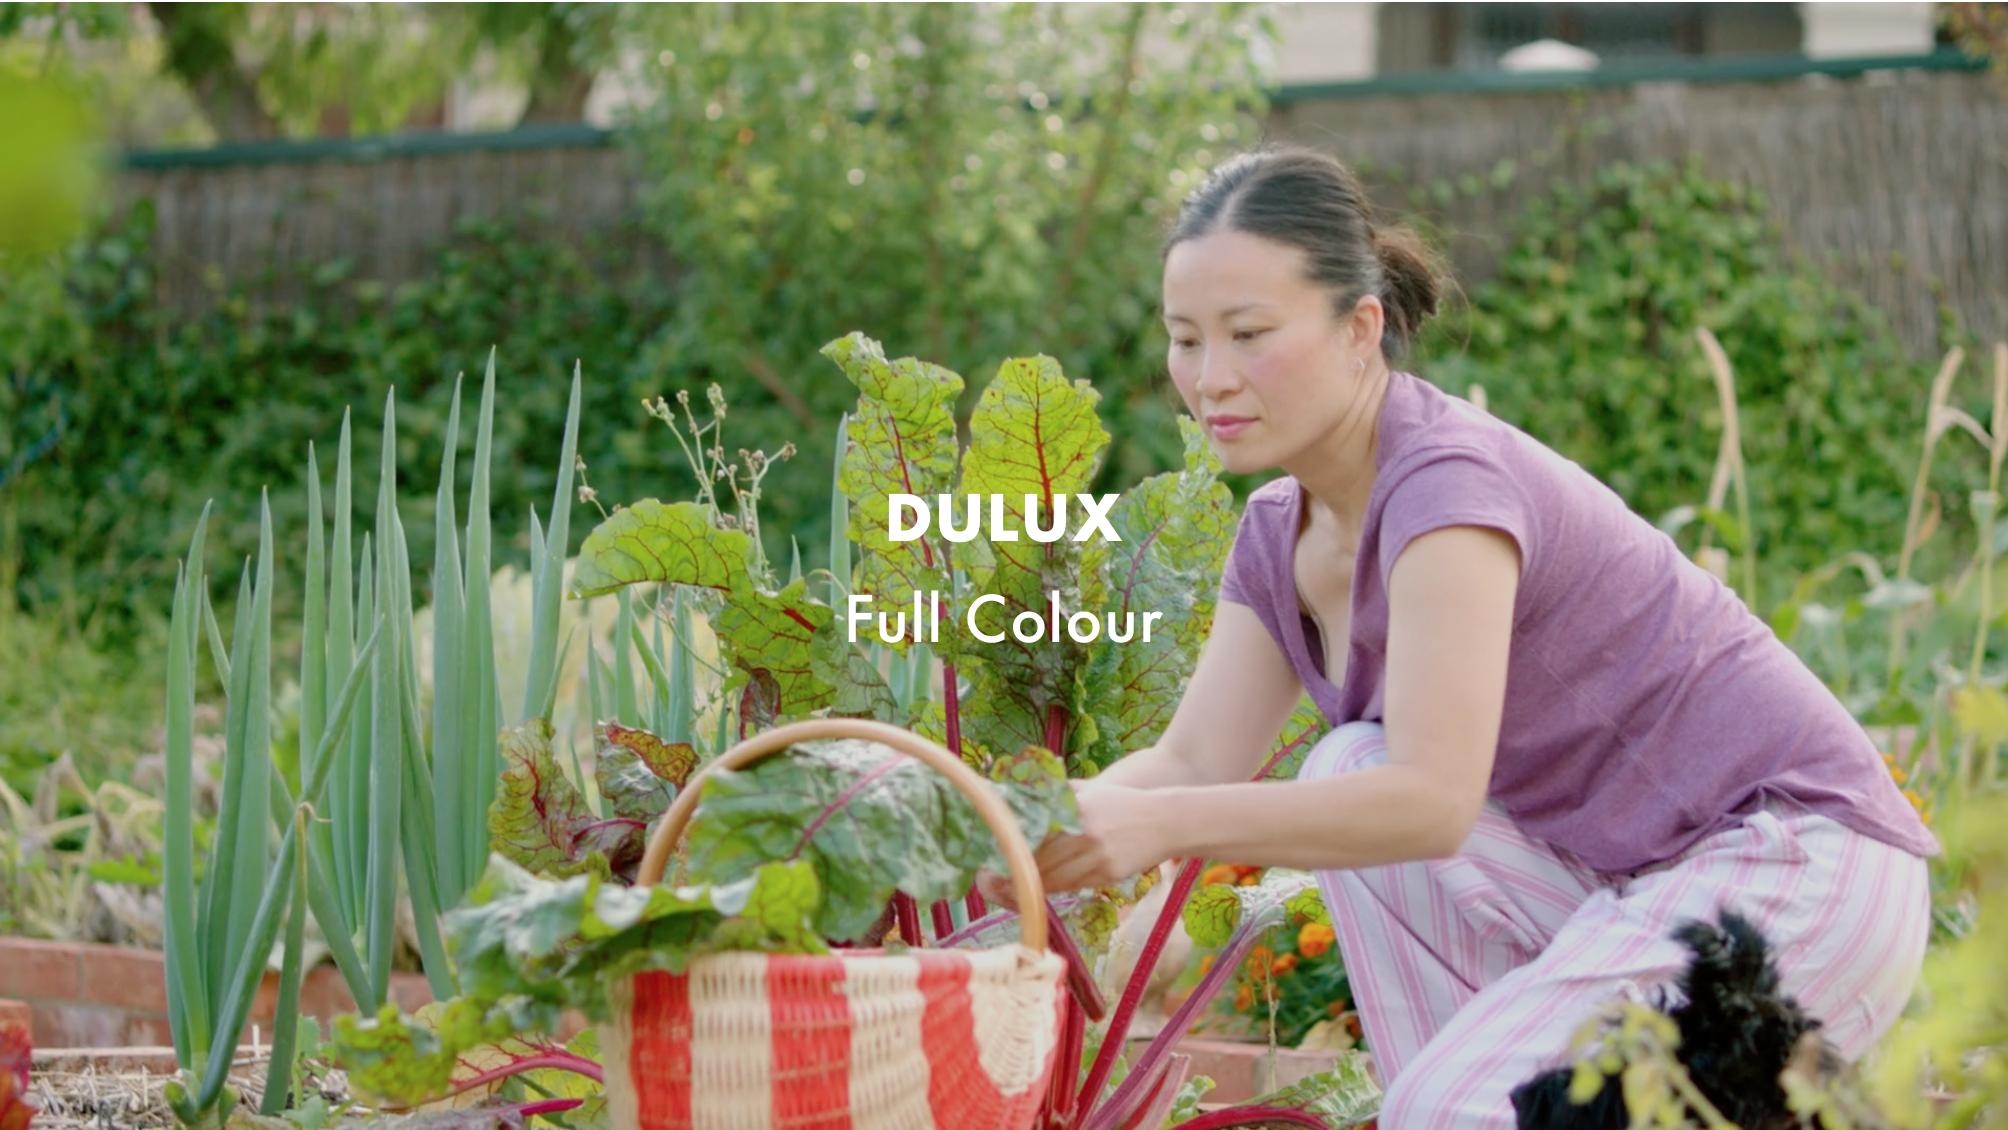 Dulux - Full Colour